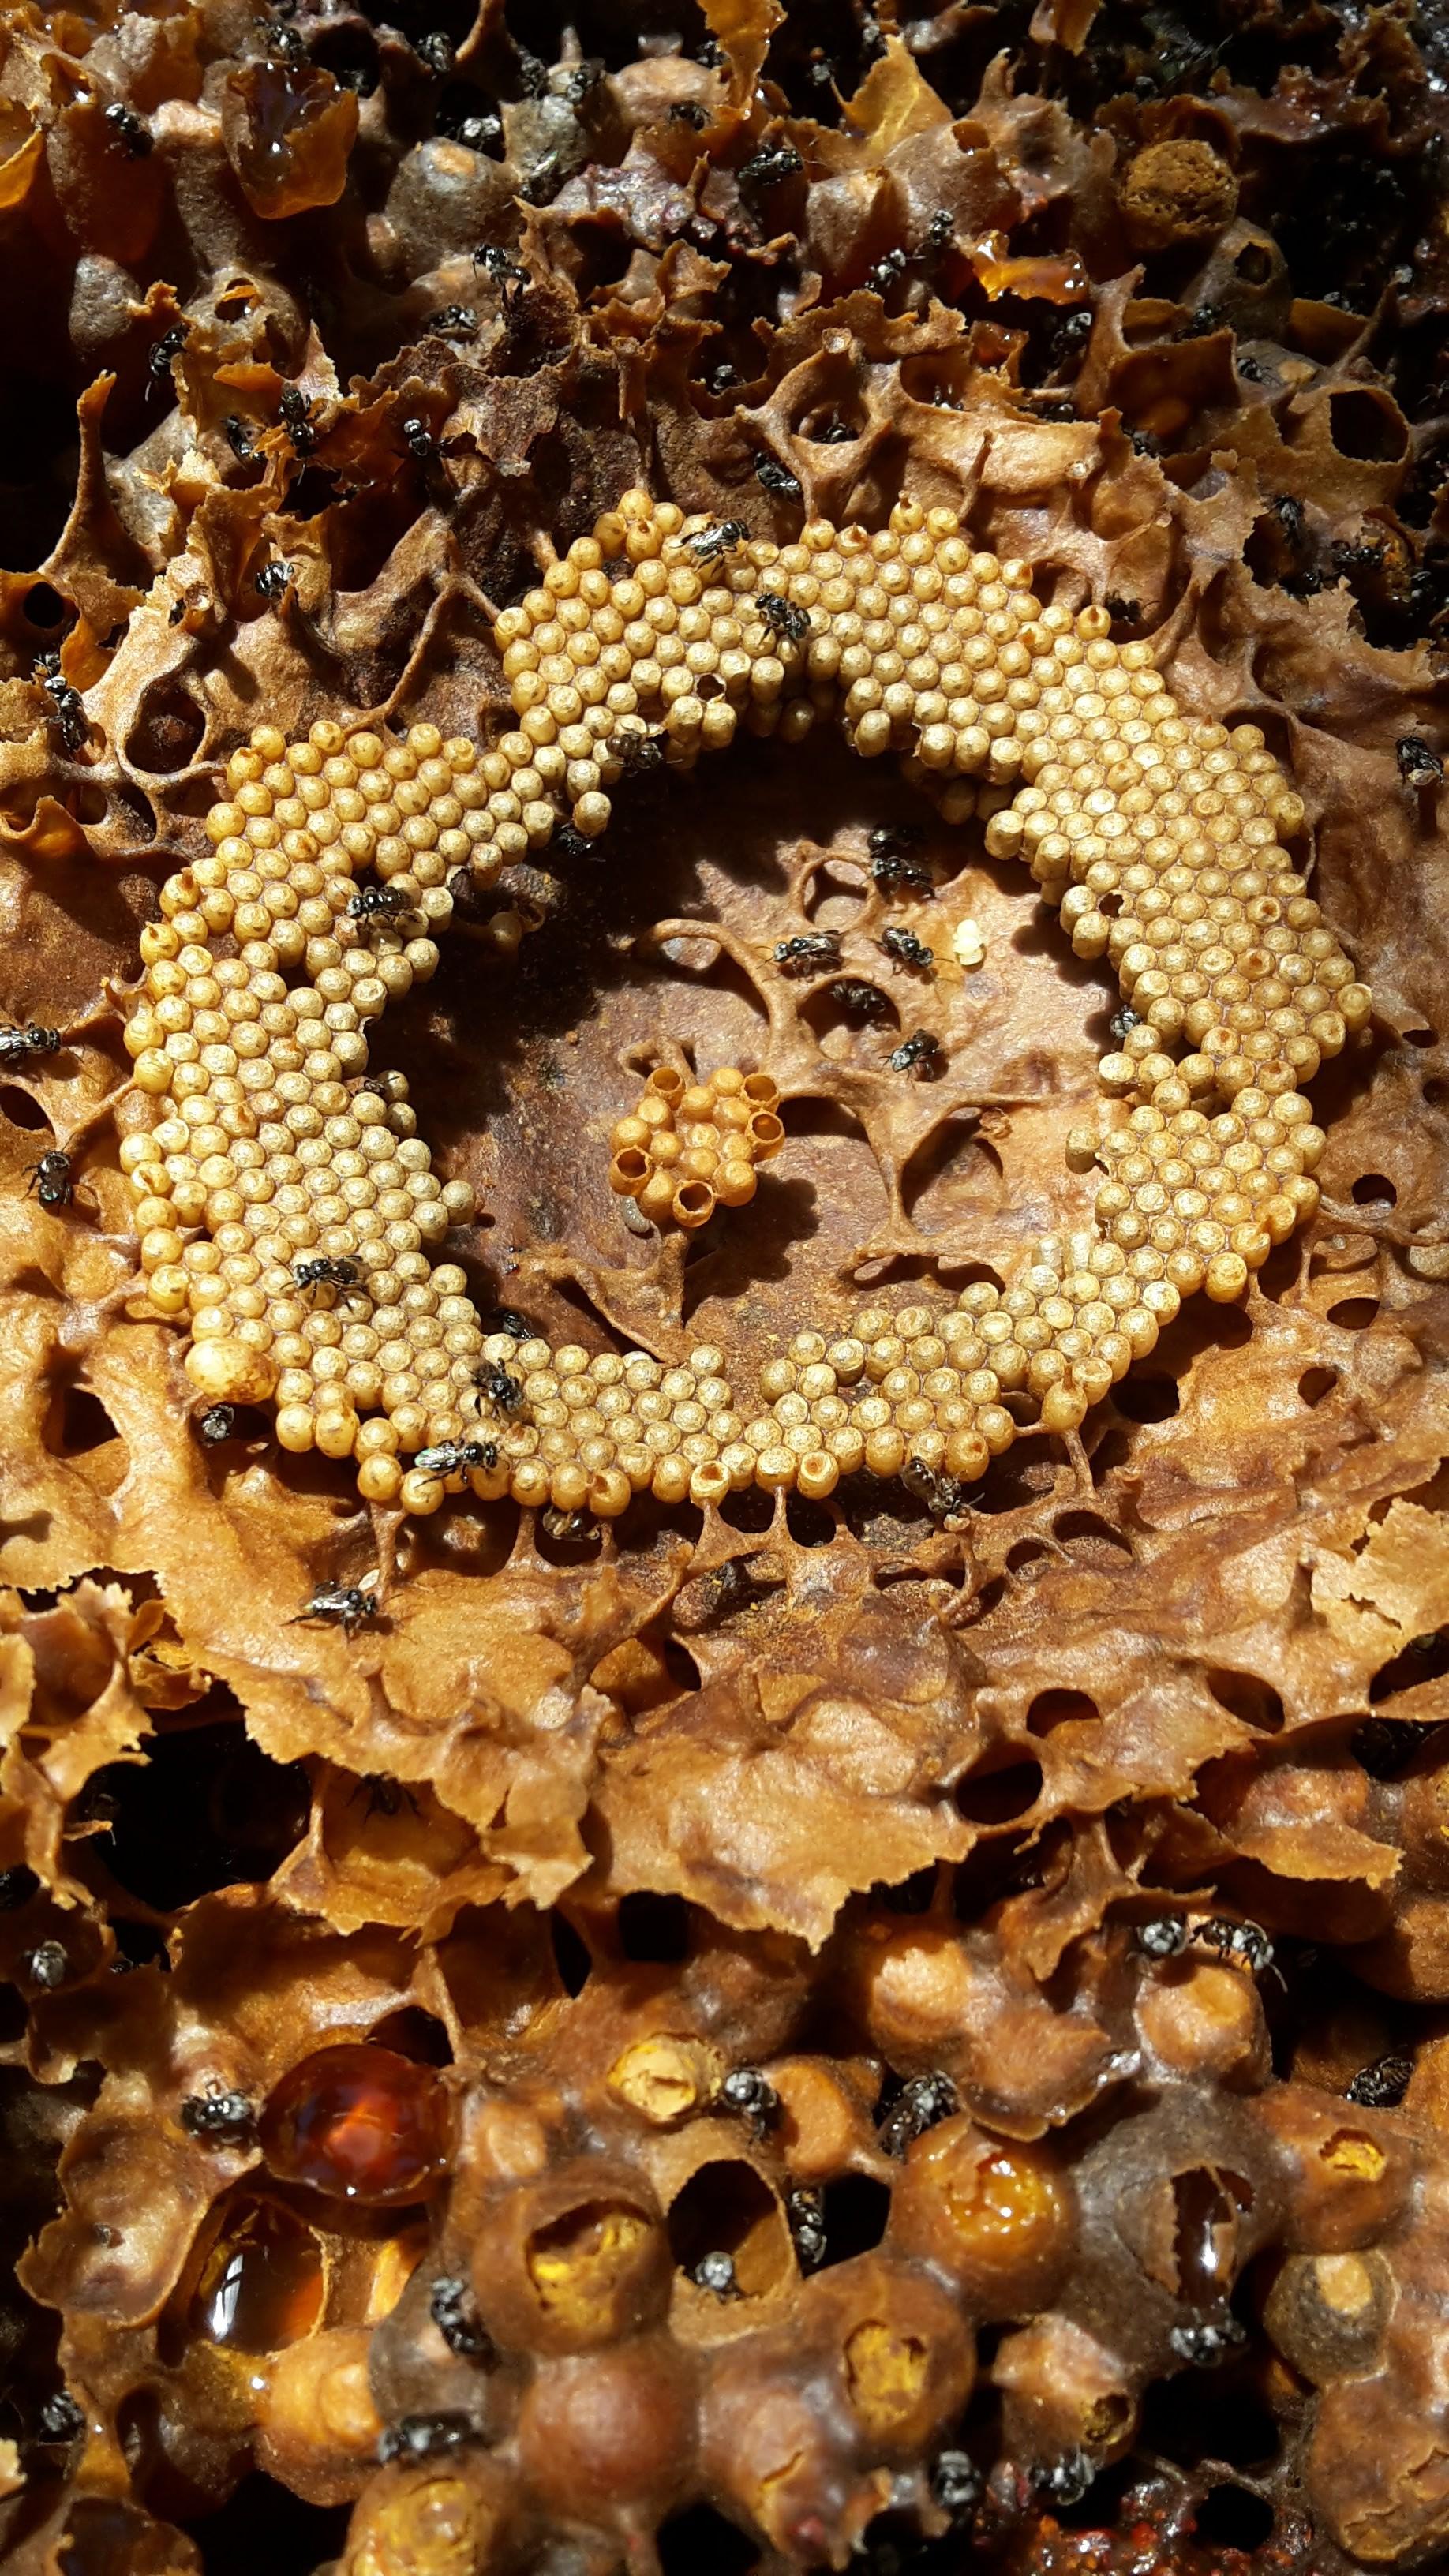 Inside a stingless bee hive